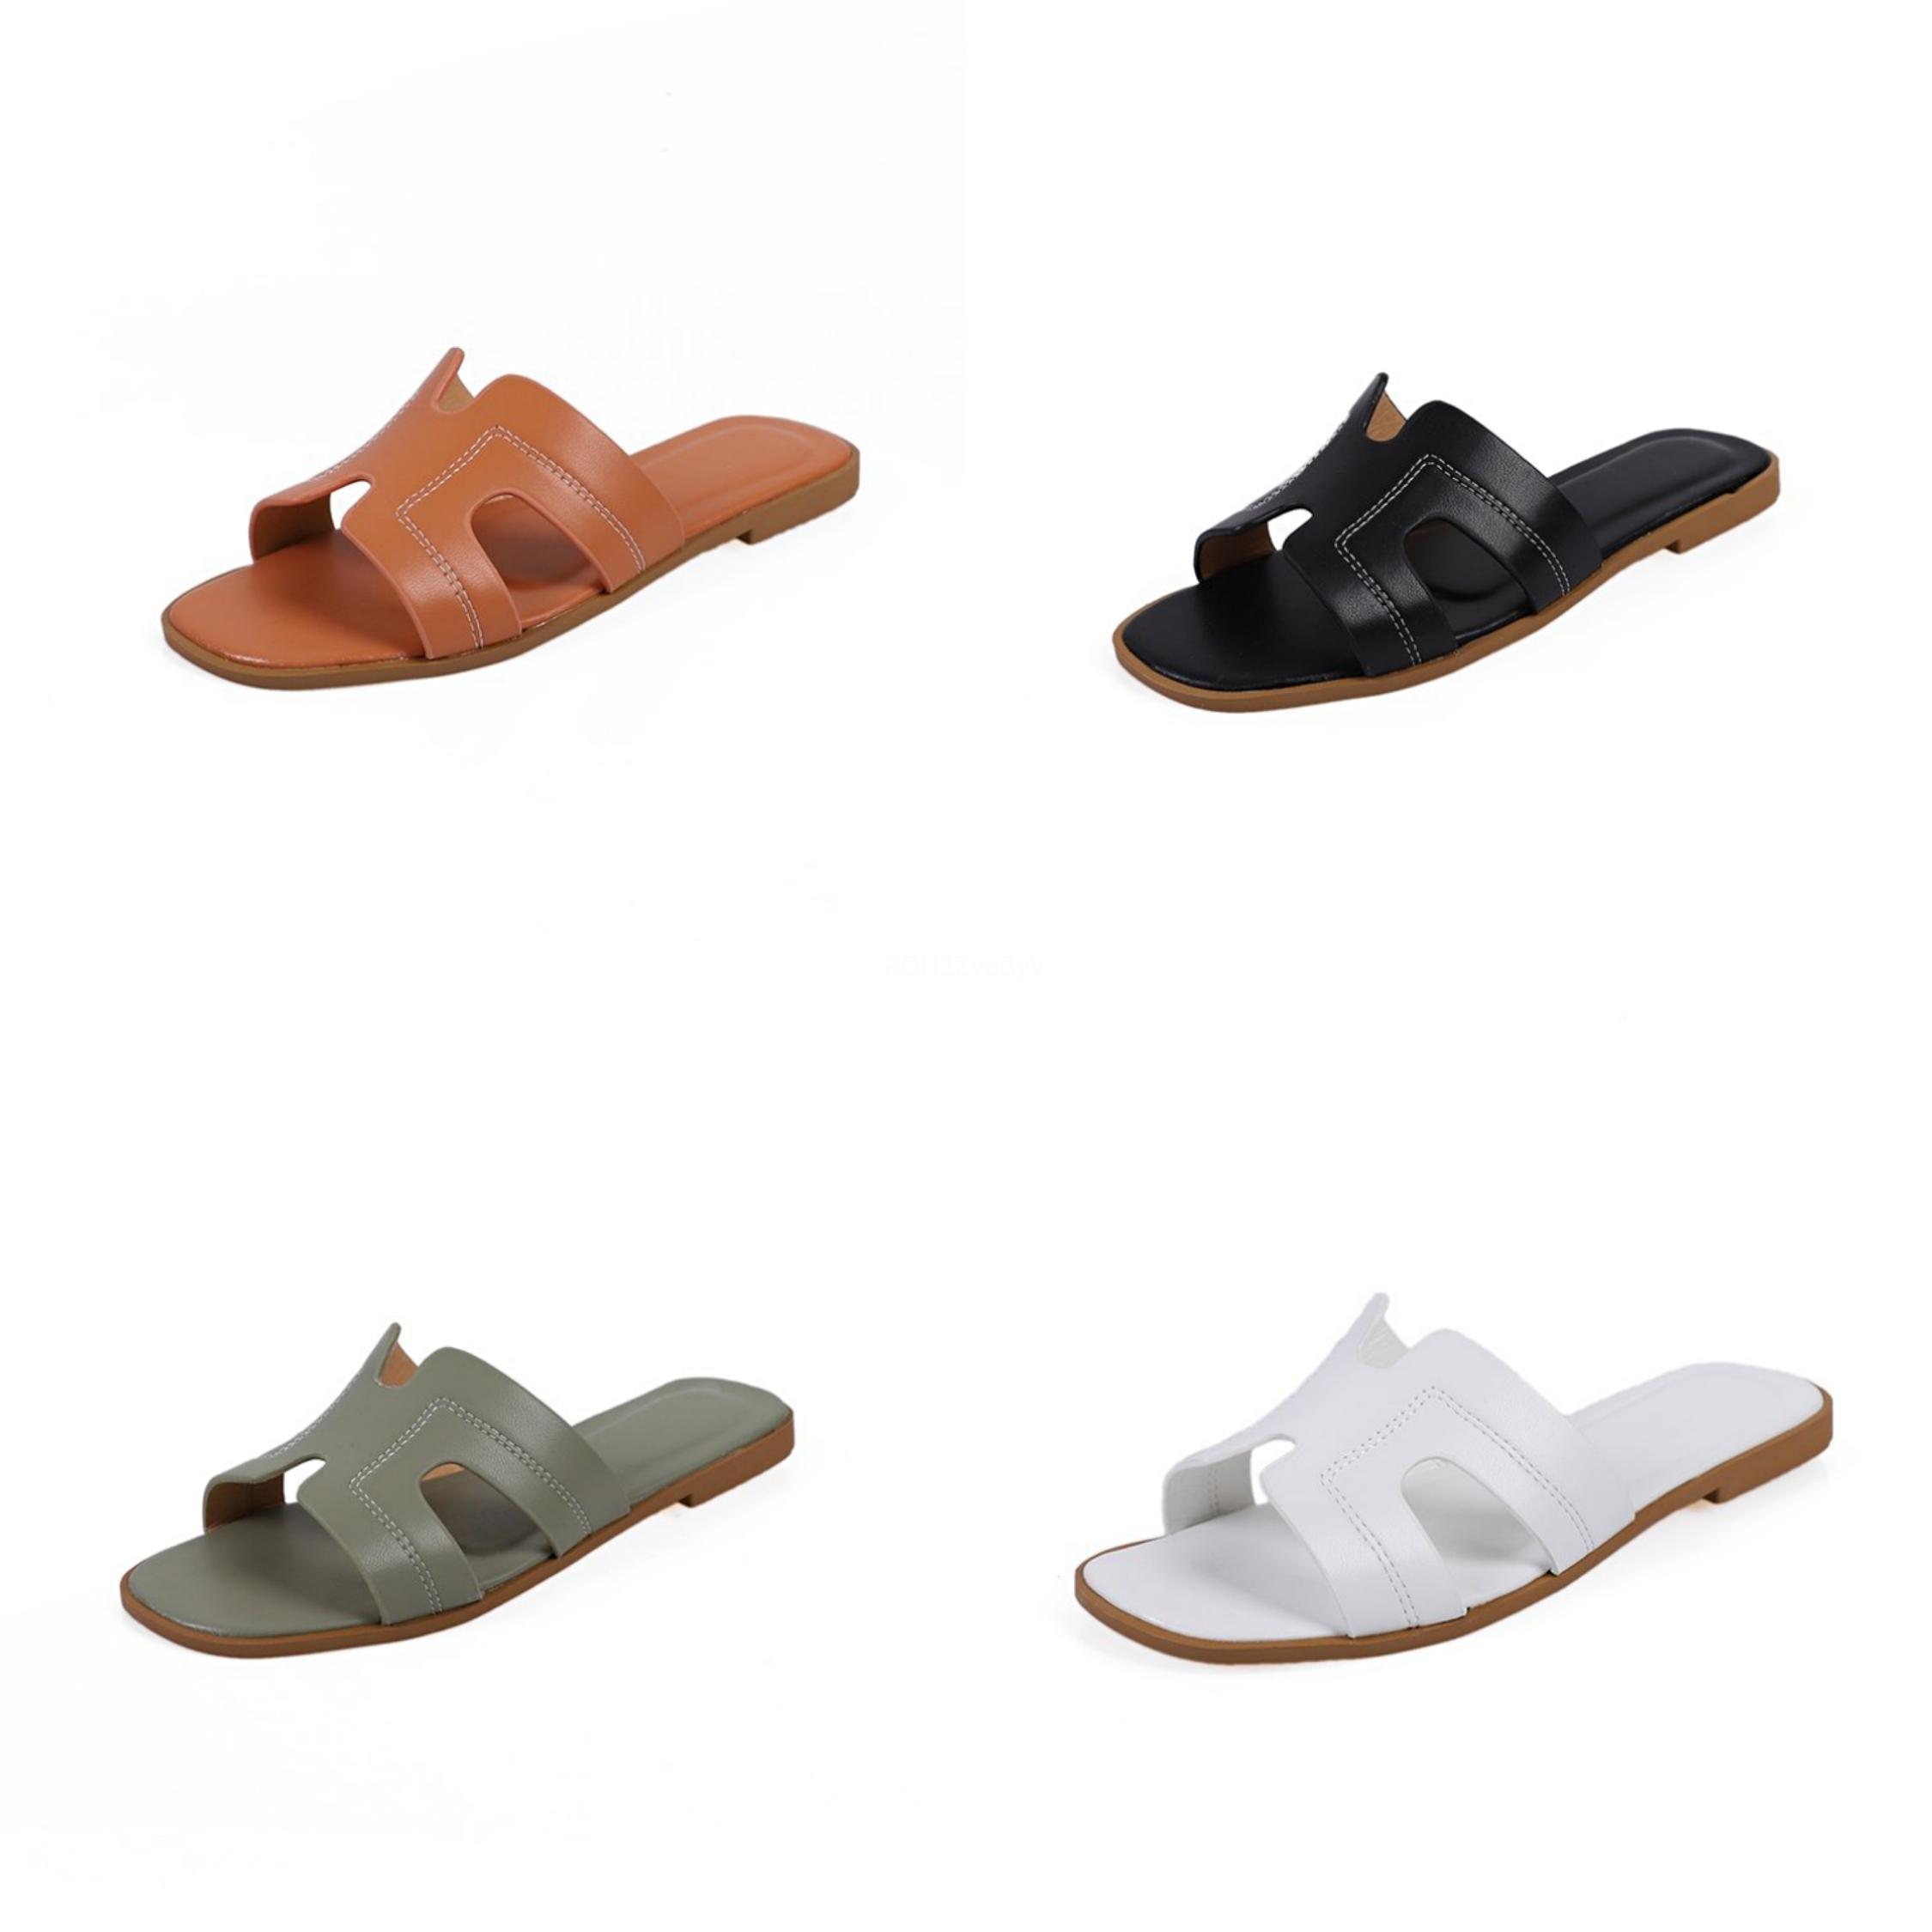 Men Sandal 2020 Slippers Flat Summer Shoes Woman Clear Heels Flip Flops Platform Ladies Women Fashion Flower Beach Comfort#971